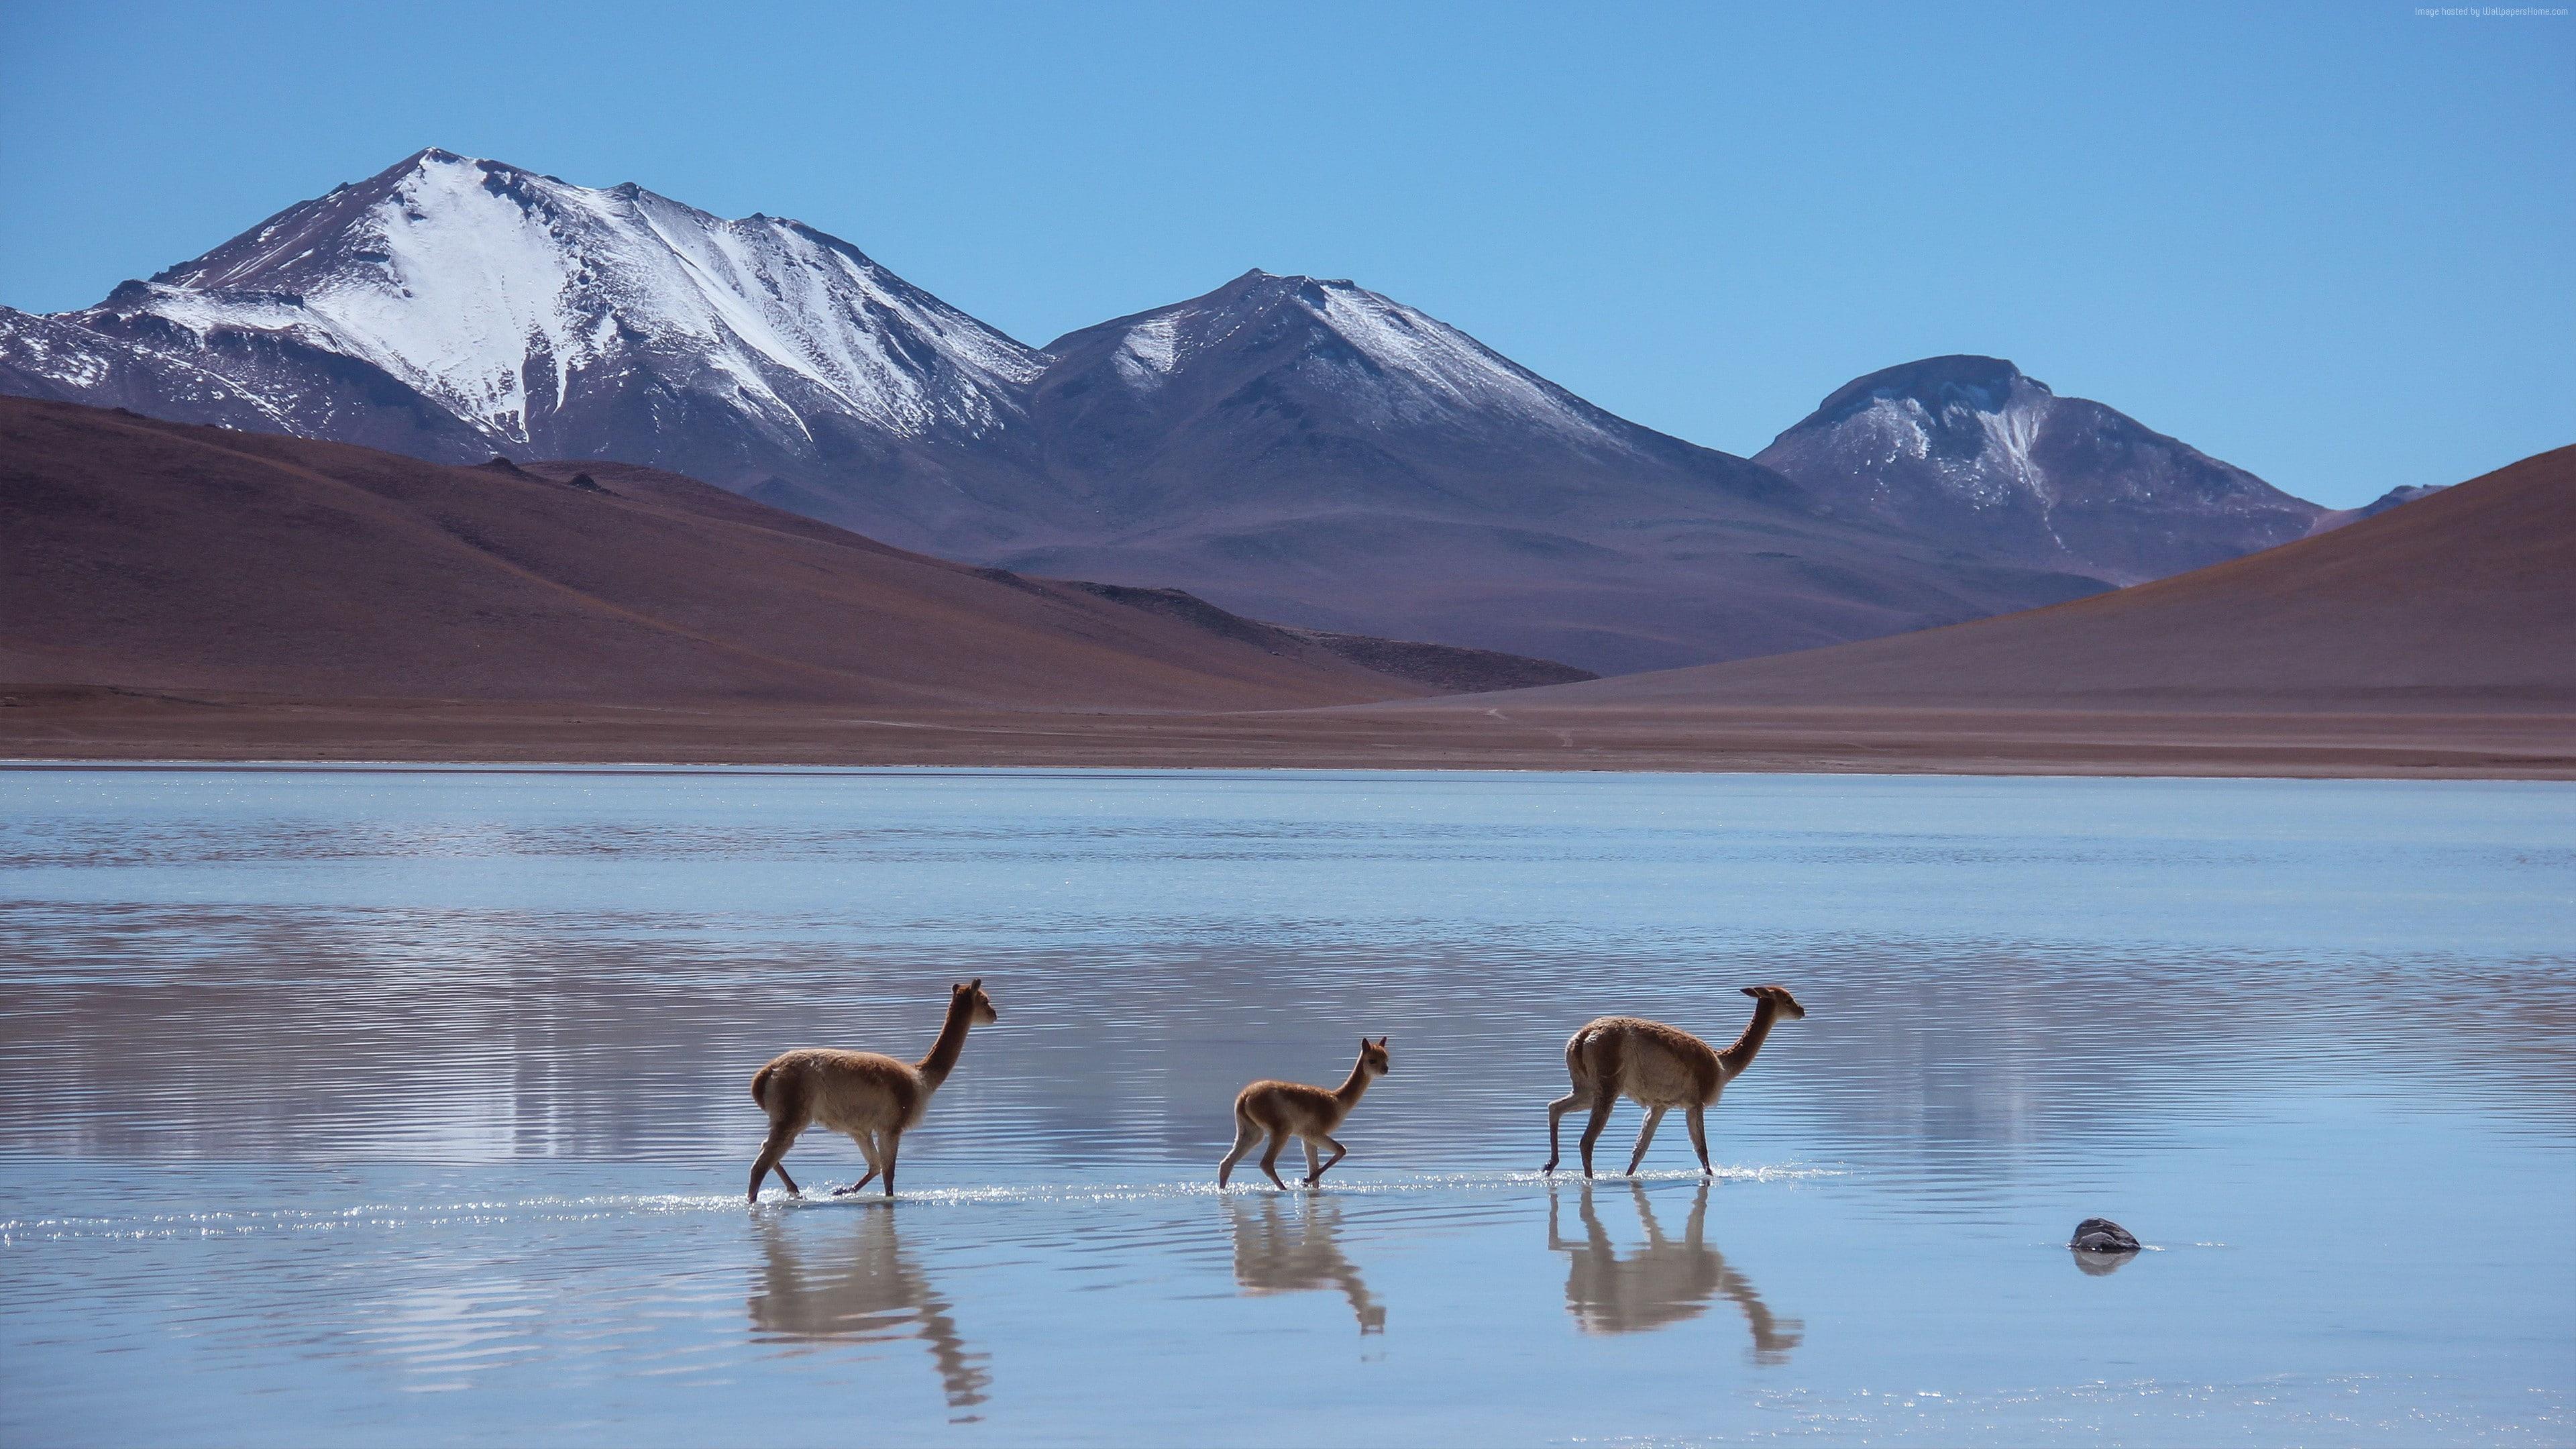 Lama Laguna Blanca Bolivia Mountains 4k 8k 16k Lama